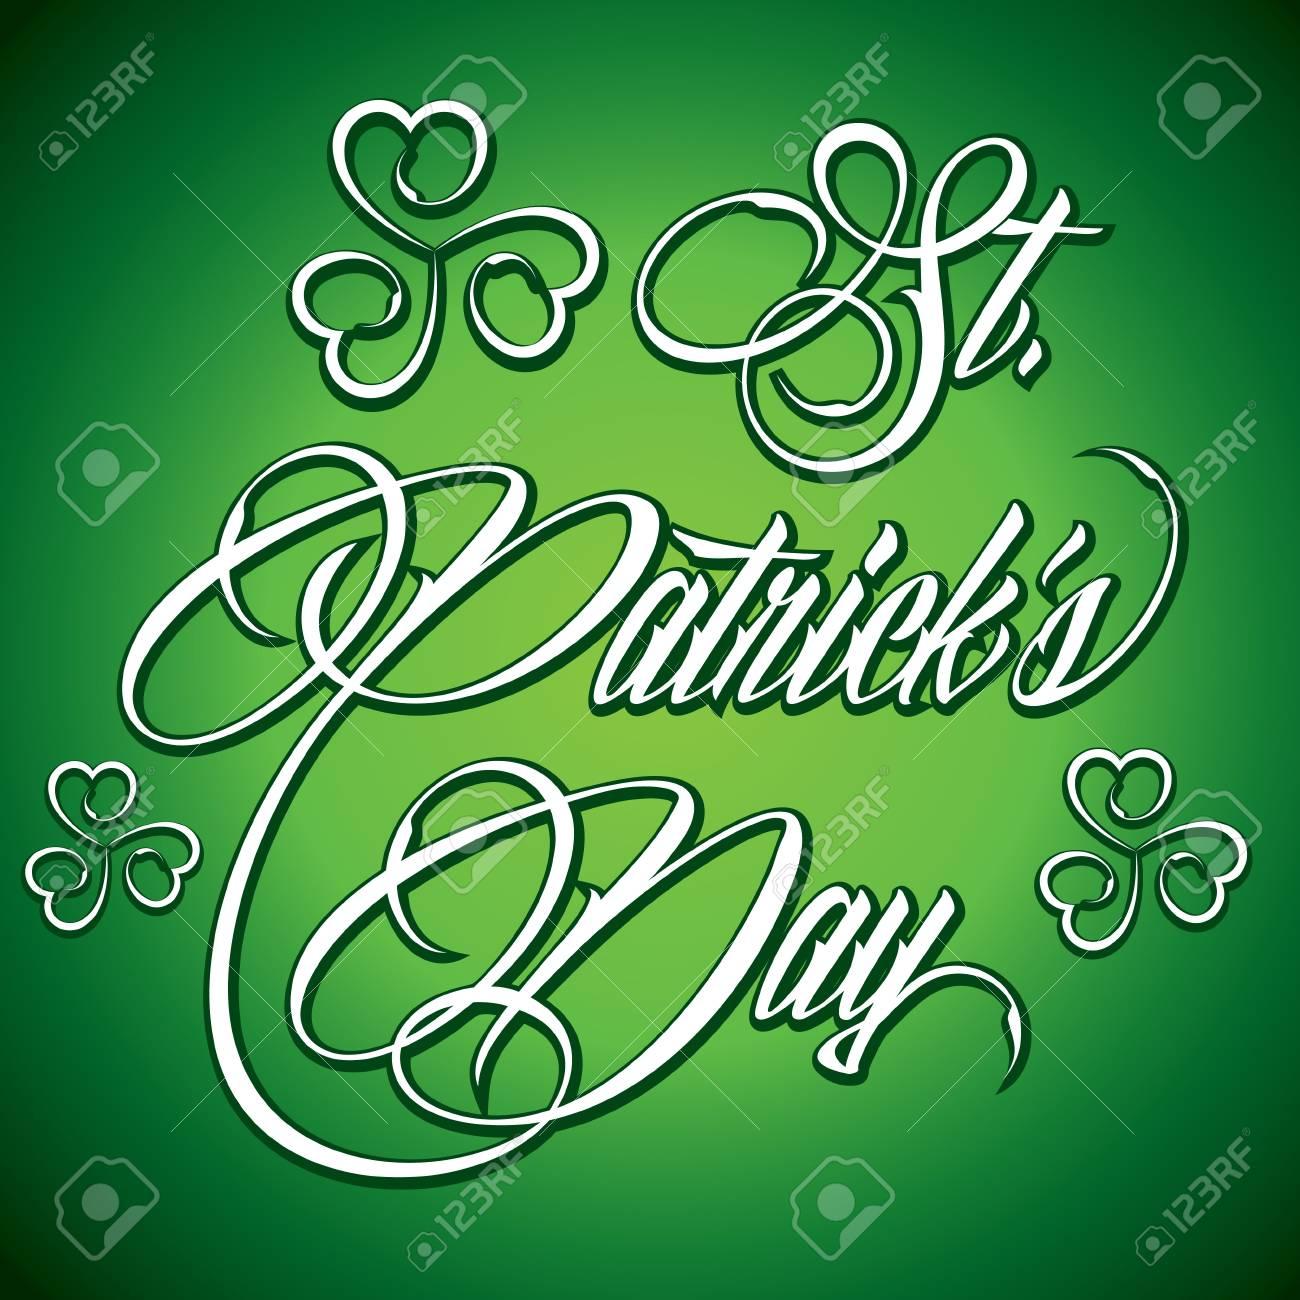 Creative design for St  Patrick s Day - vector illustration Stock Vector - 21490883